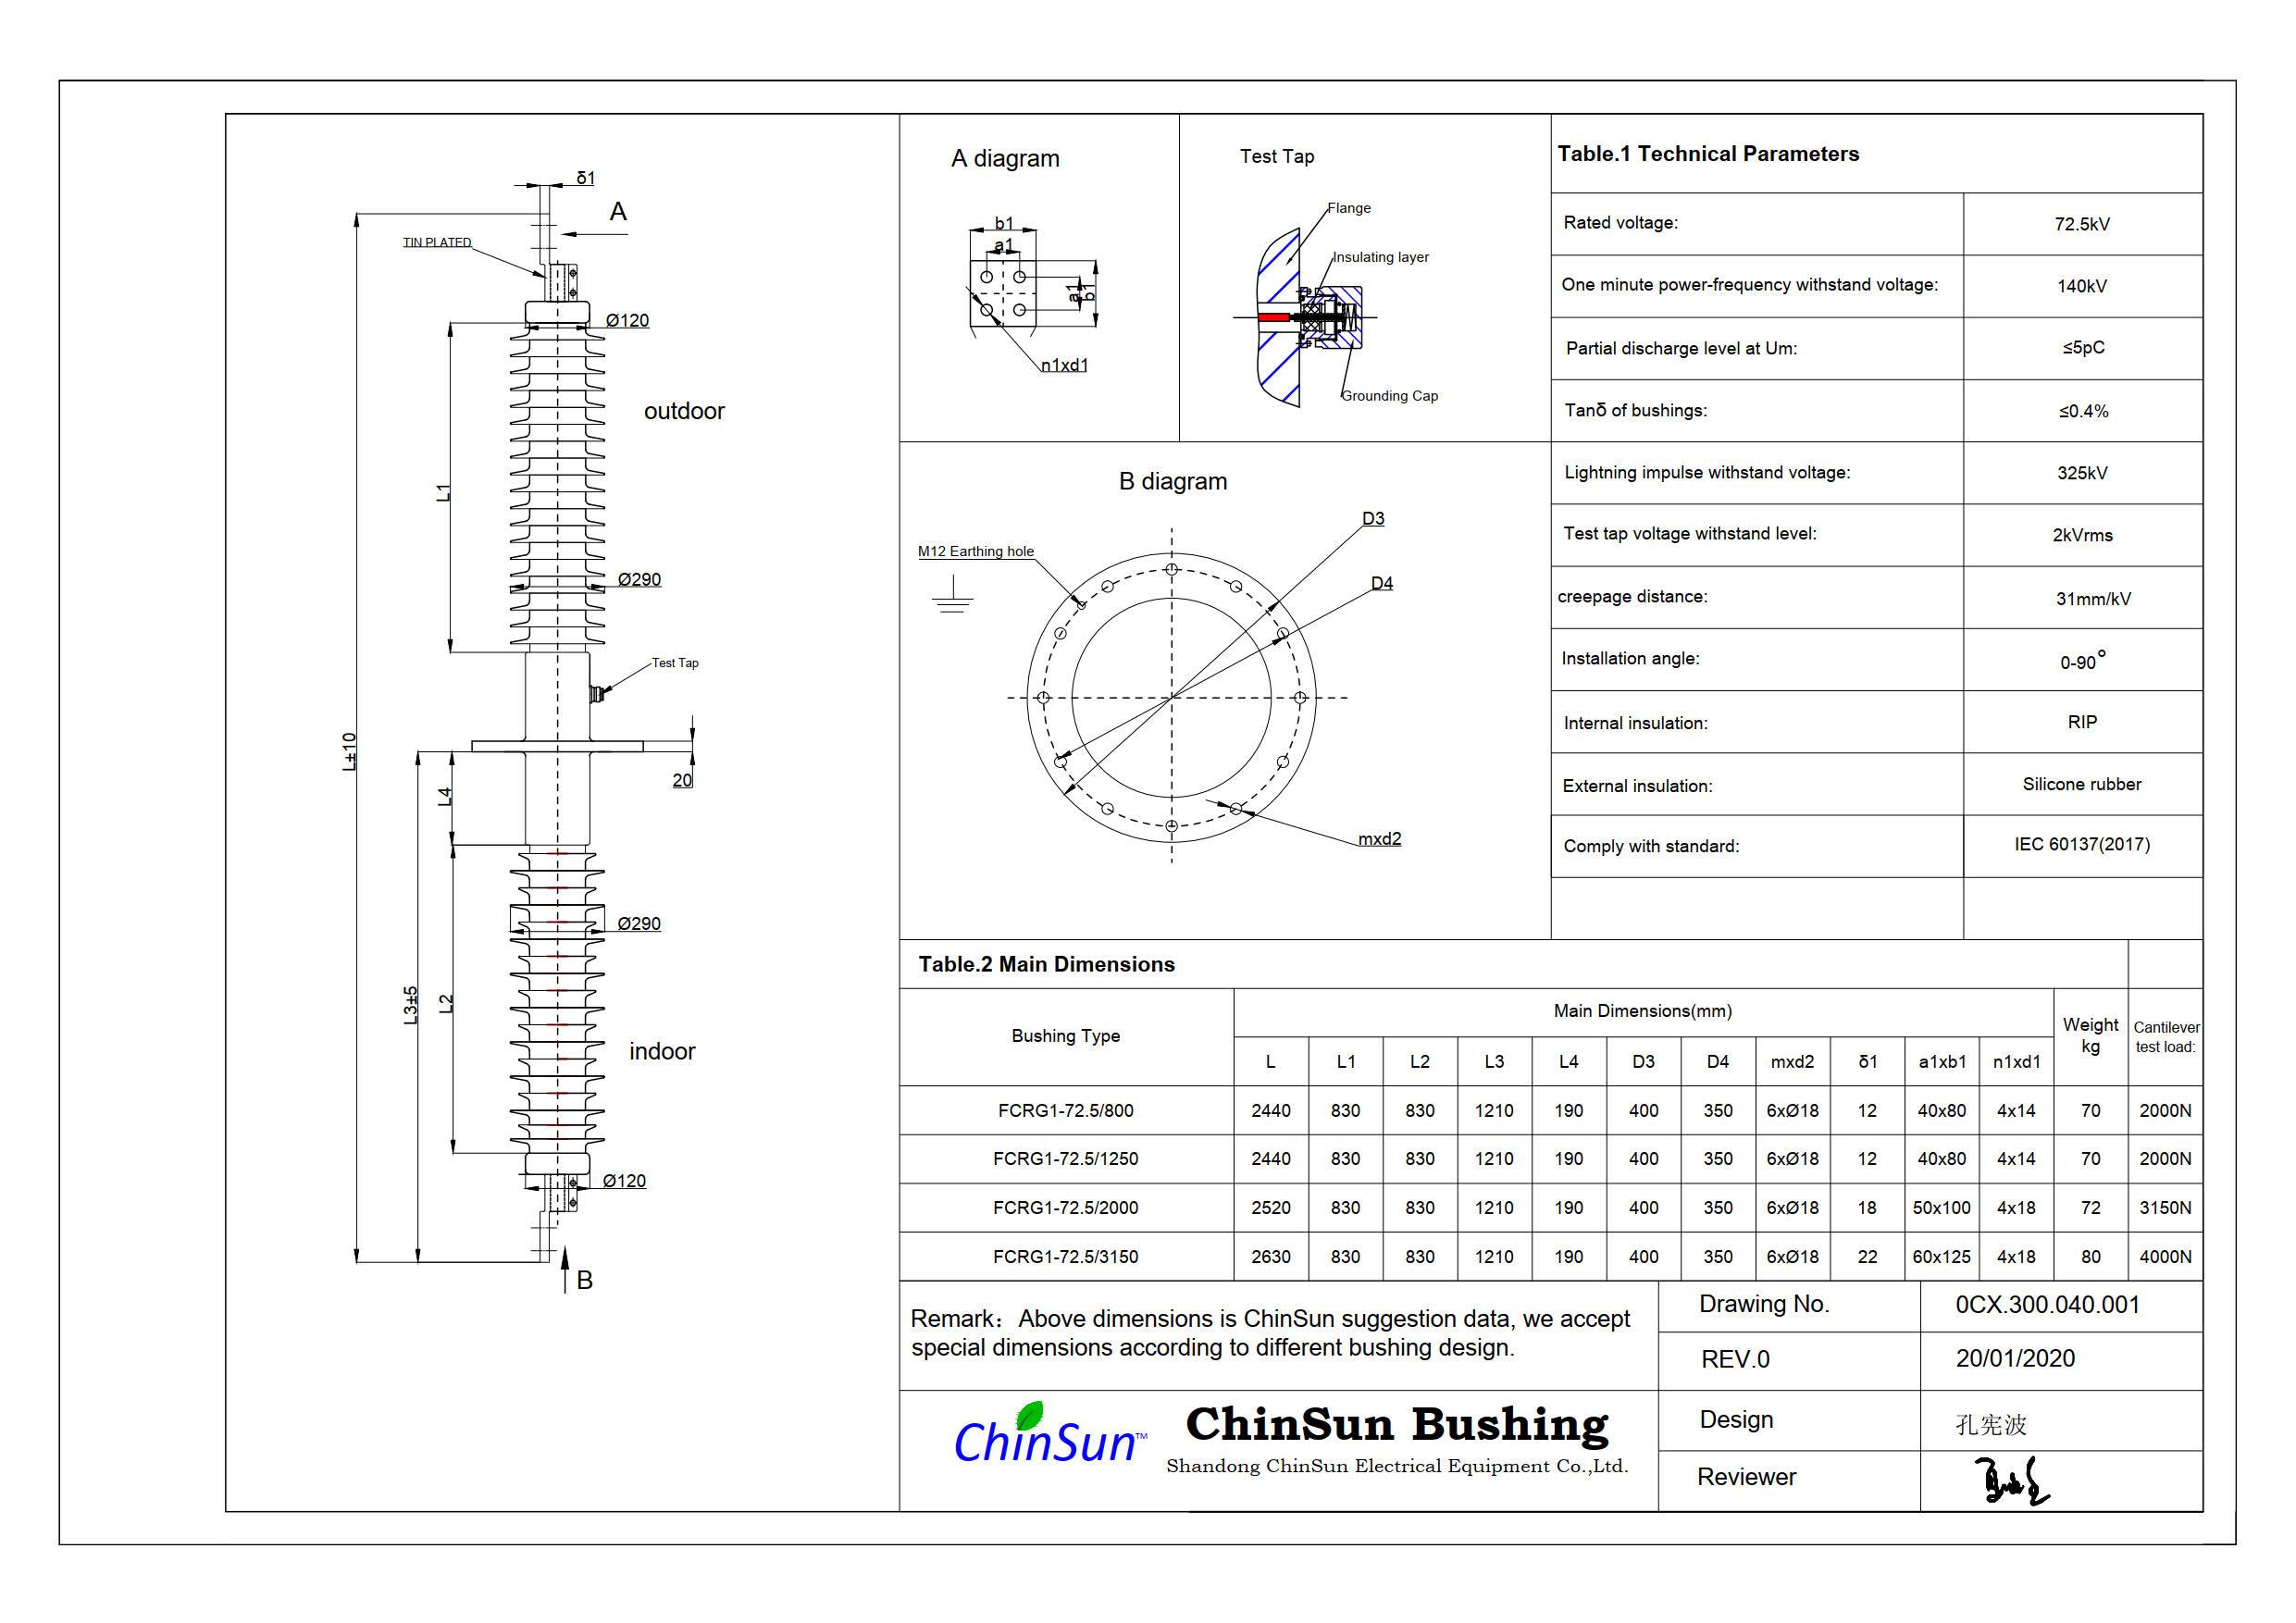 Drawing-wall bushing-72.5kV silicone rubber-ChinSun